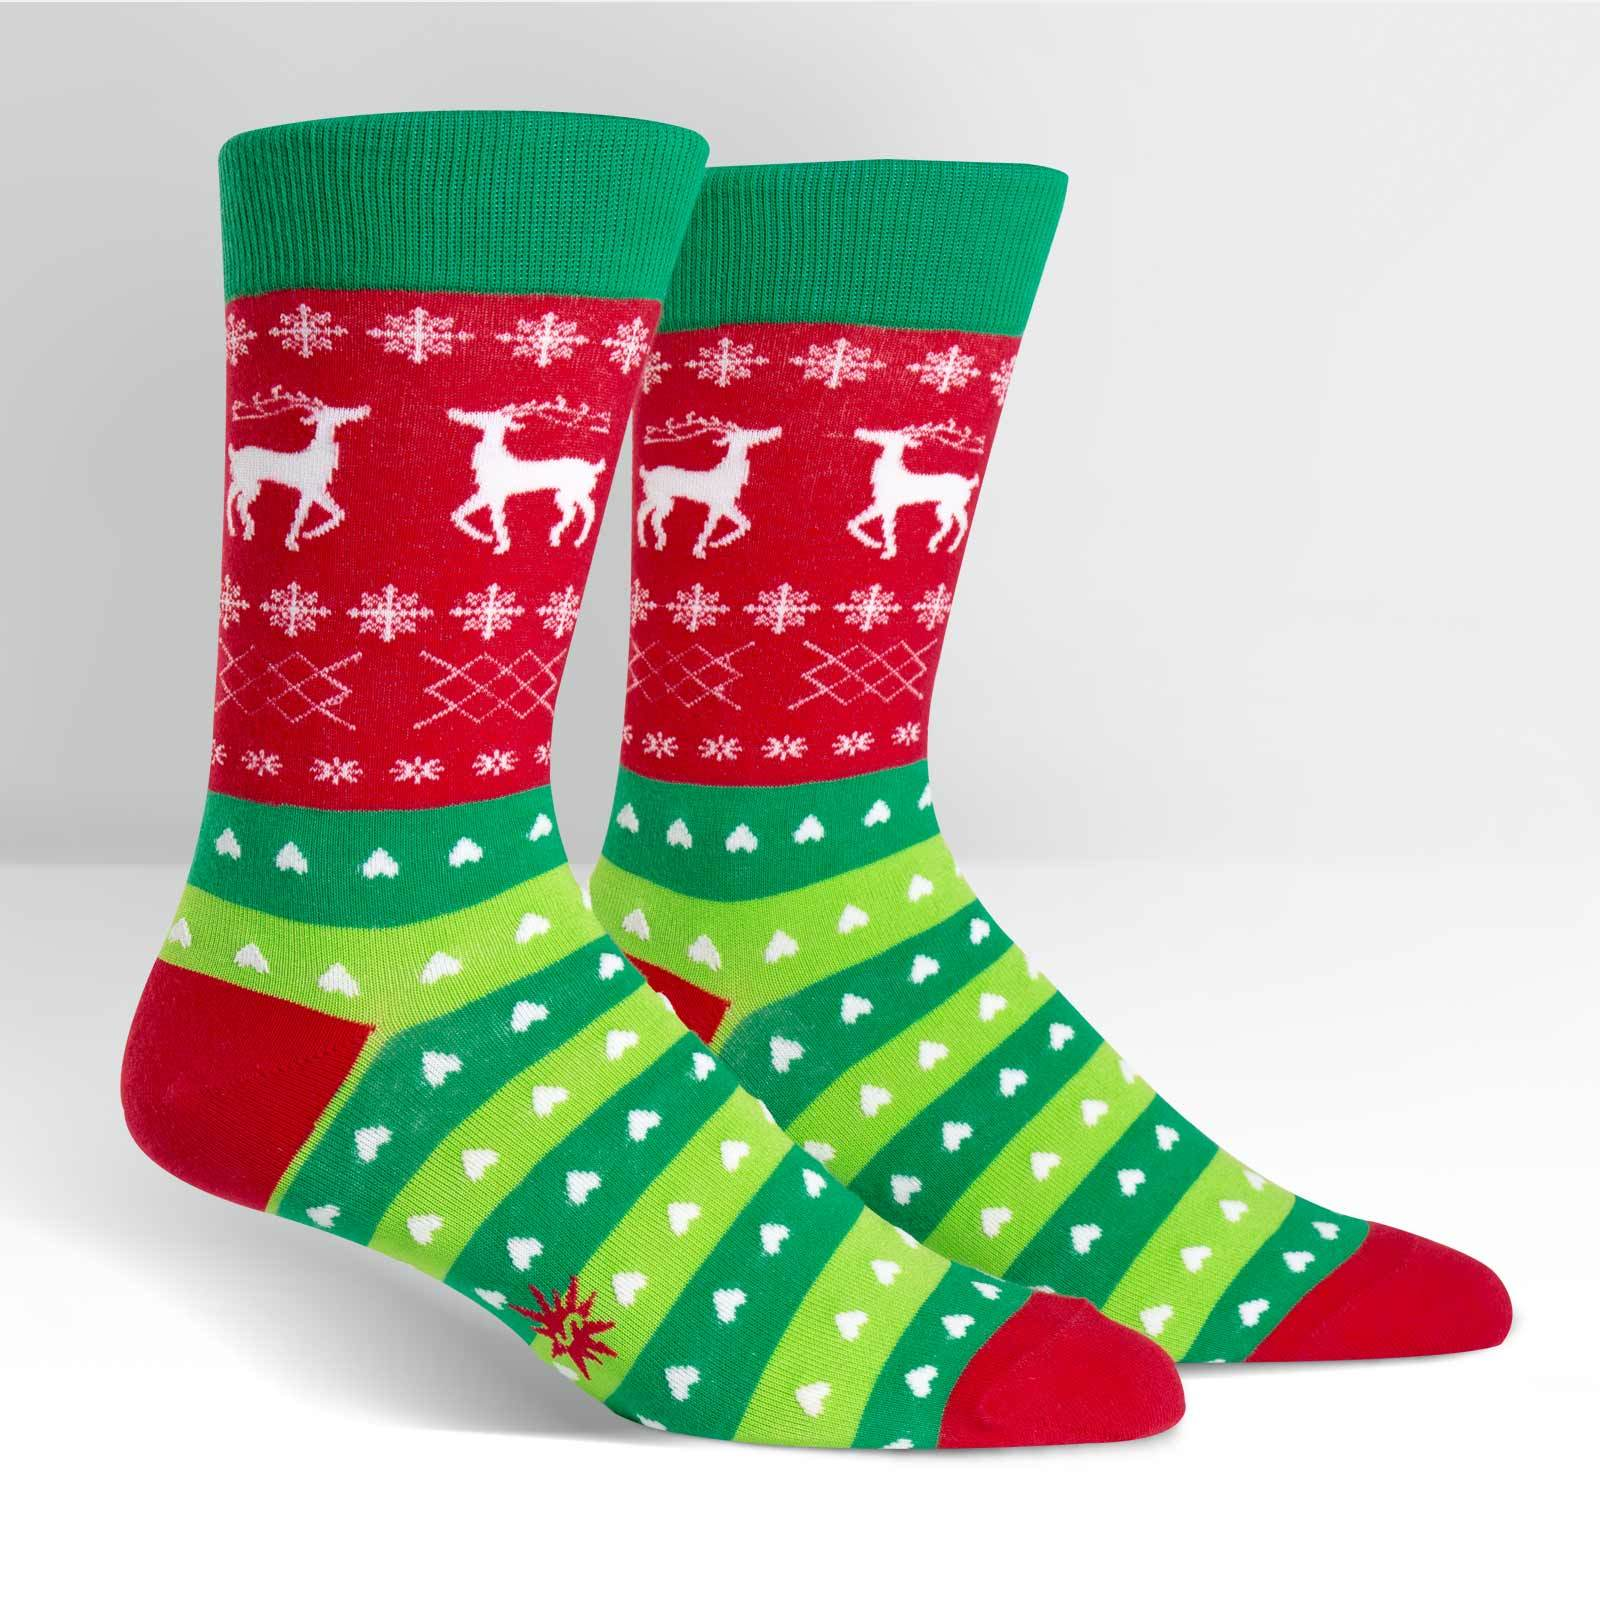 c92b5b01ae9 Sweater Socks Related Keywords   Suggestions - Sweater Socks Long ...